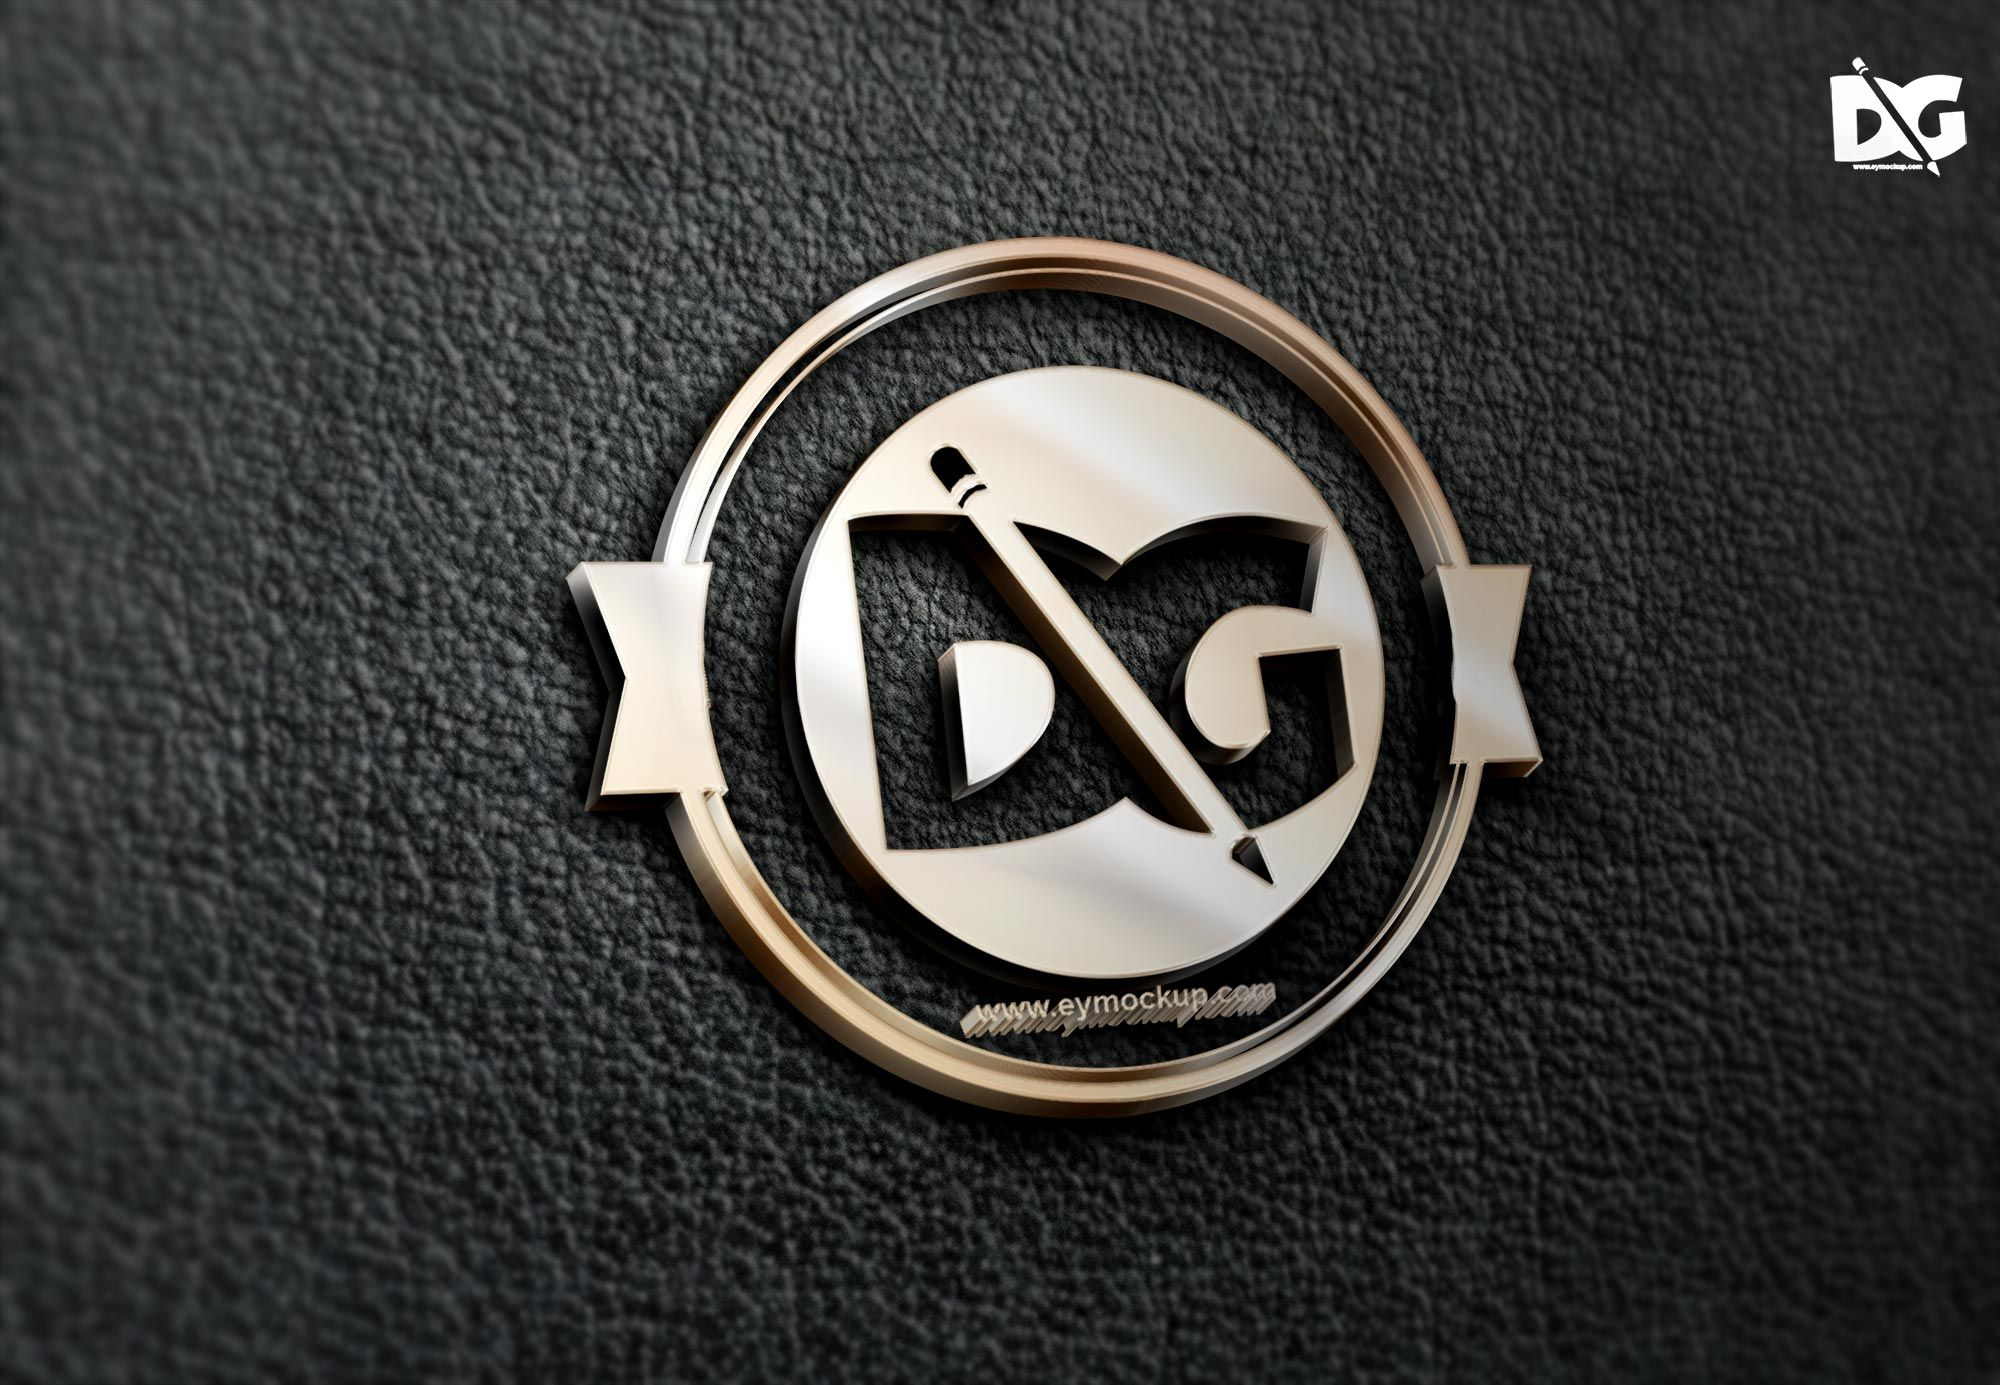 Free Leather 3d Effect Logo Mock Up 3deffectmock Up 3dlogomock Up Branding Downloadpsd Freepsd Logomo Logo Design Mockup Free Logo Mockup Mockup Free Psd